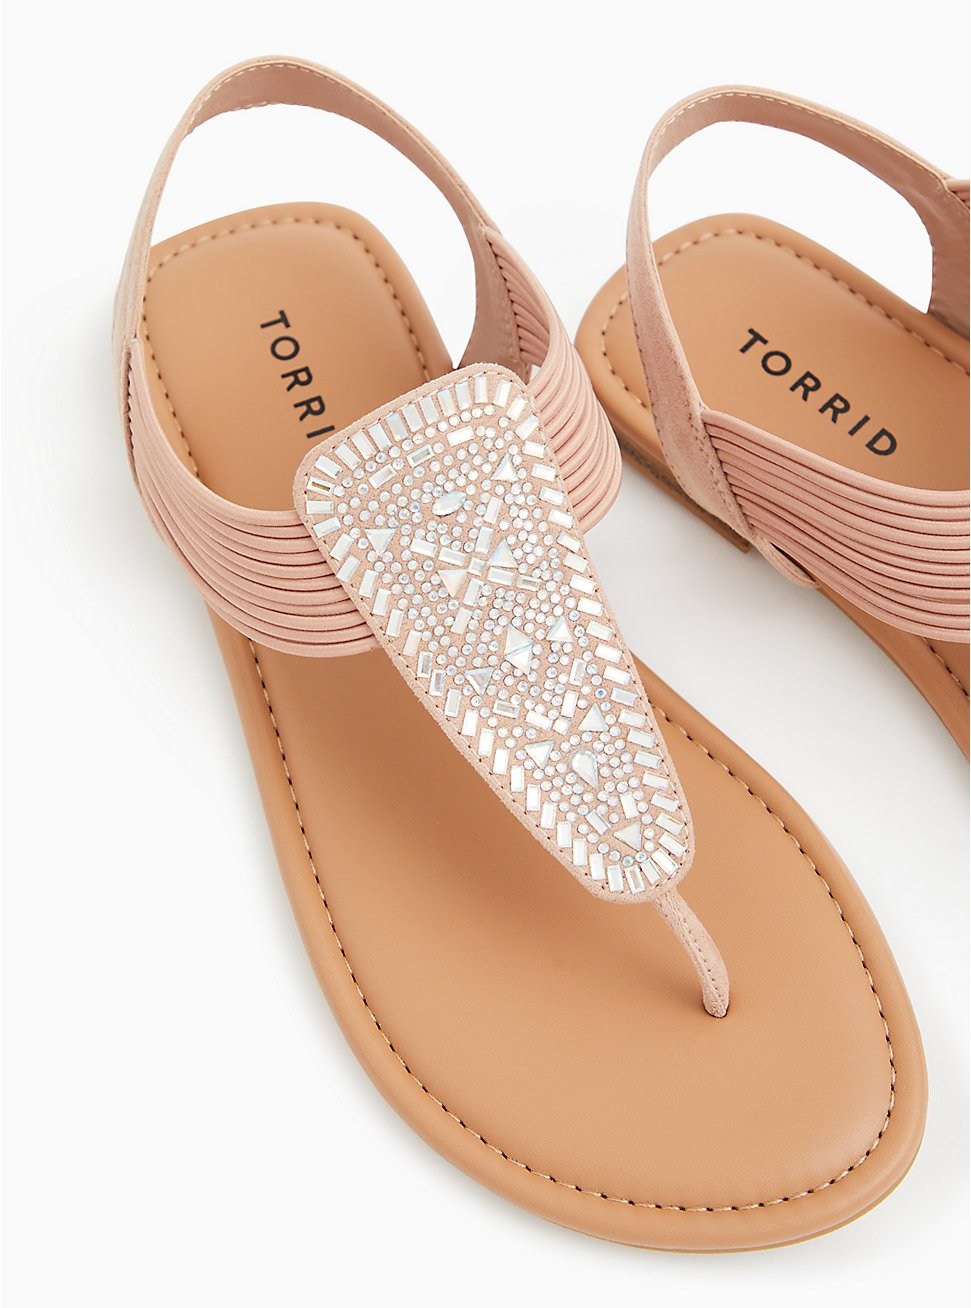 Plus Size Blush Pink Elastic Band T-Strap Sandal (WW), BLUSH, hi-res